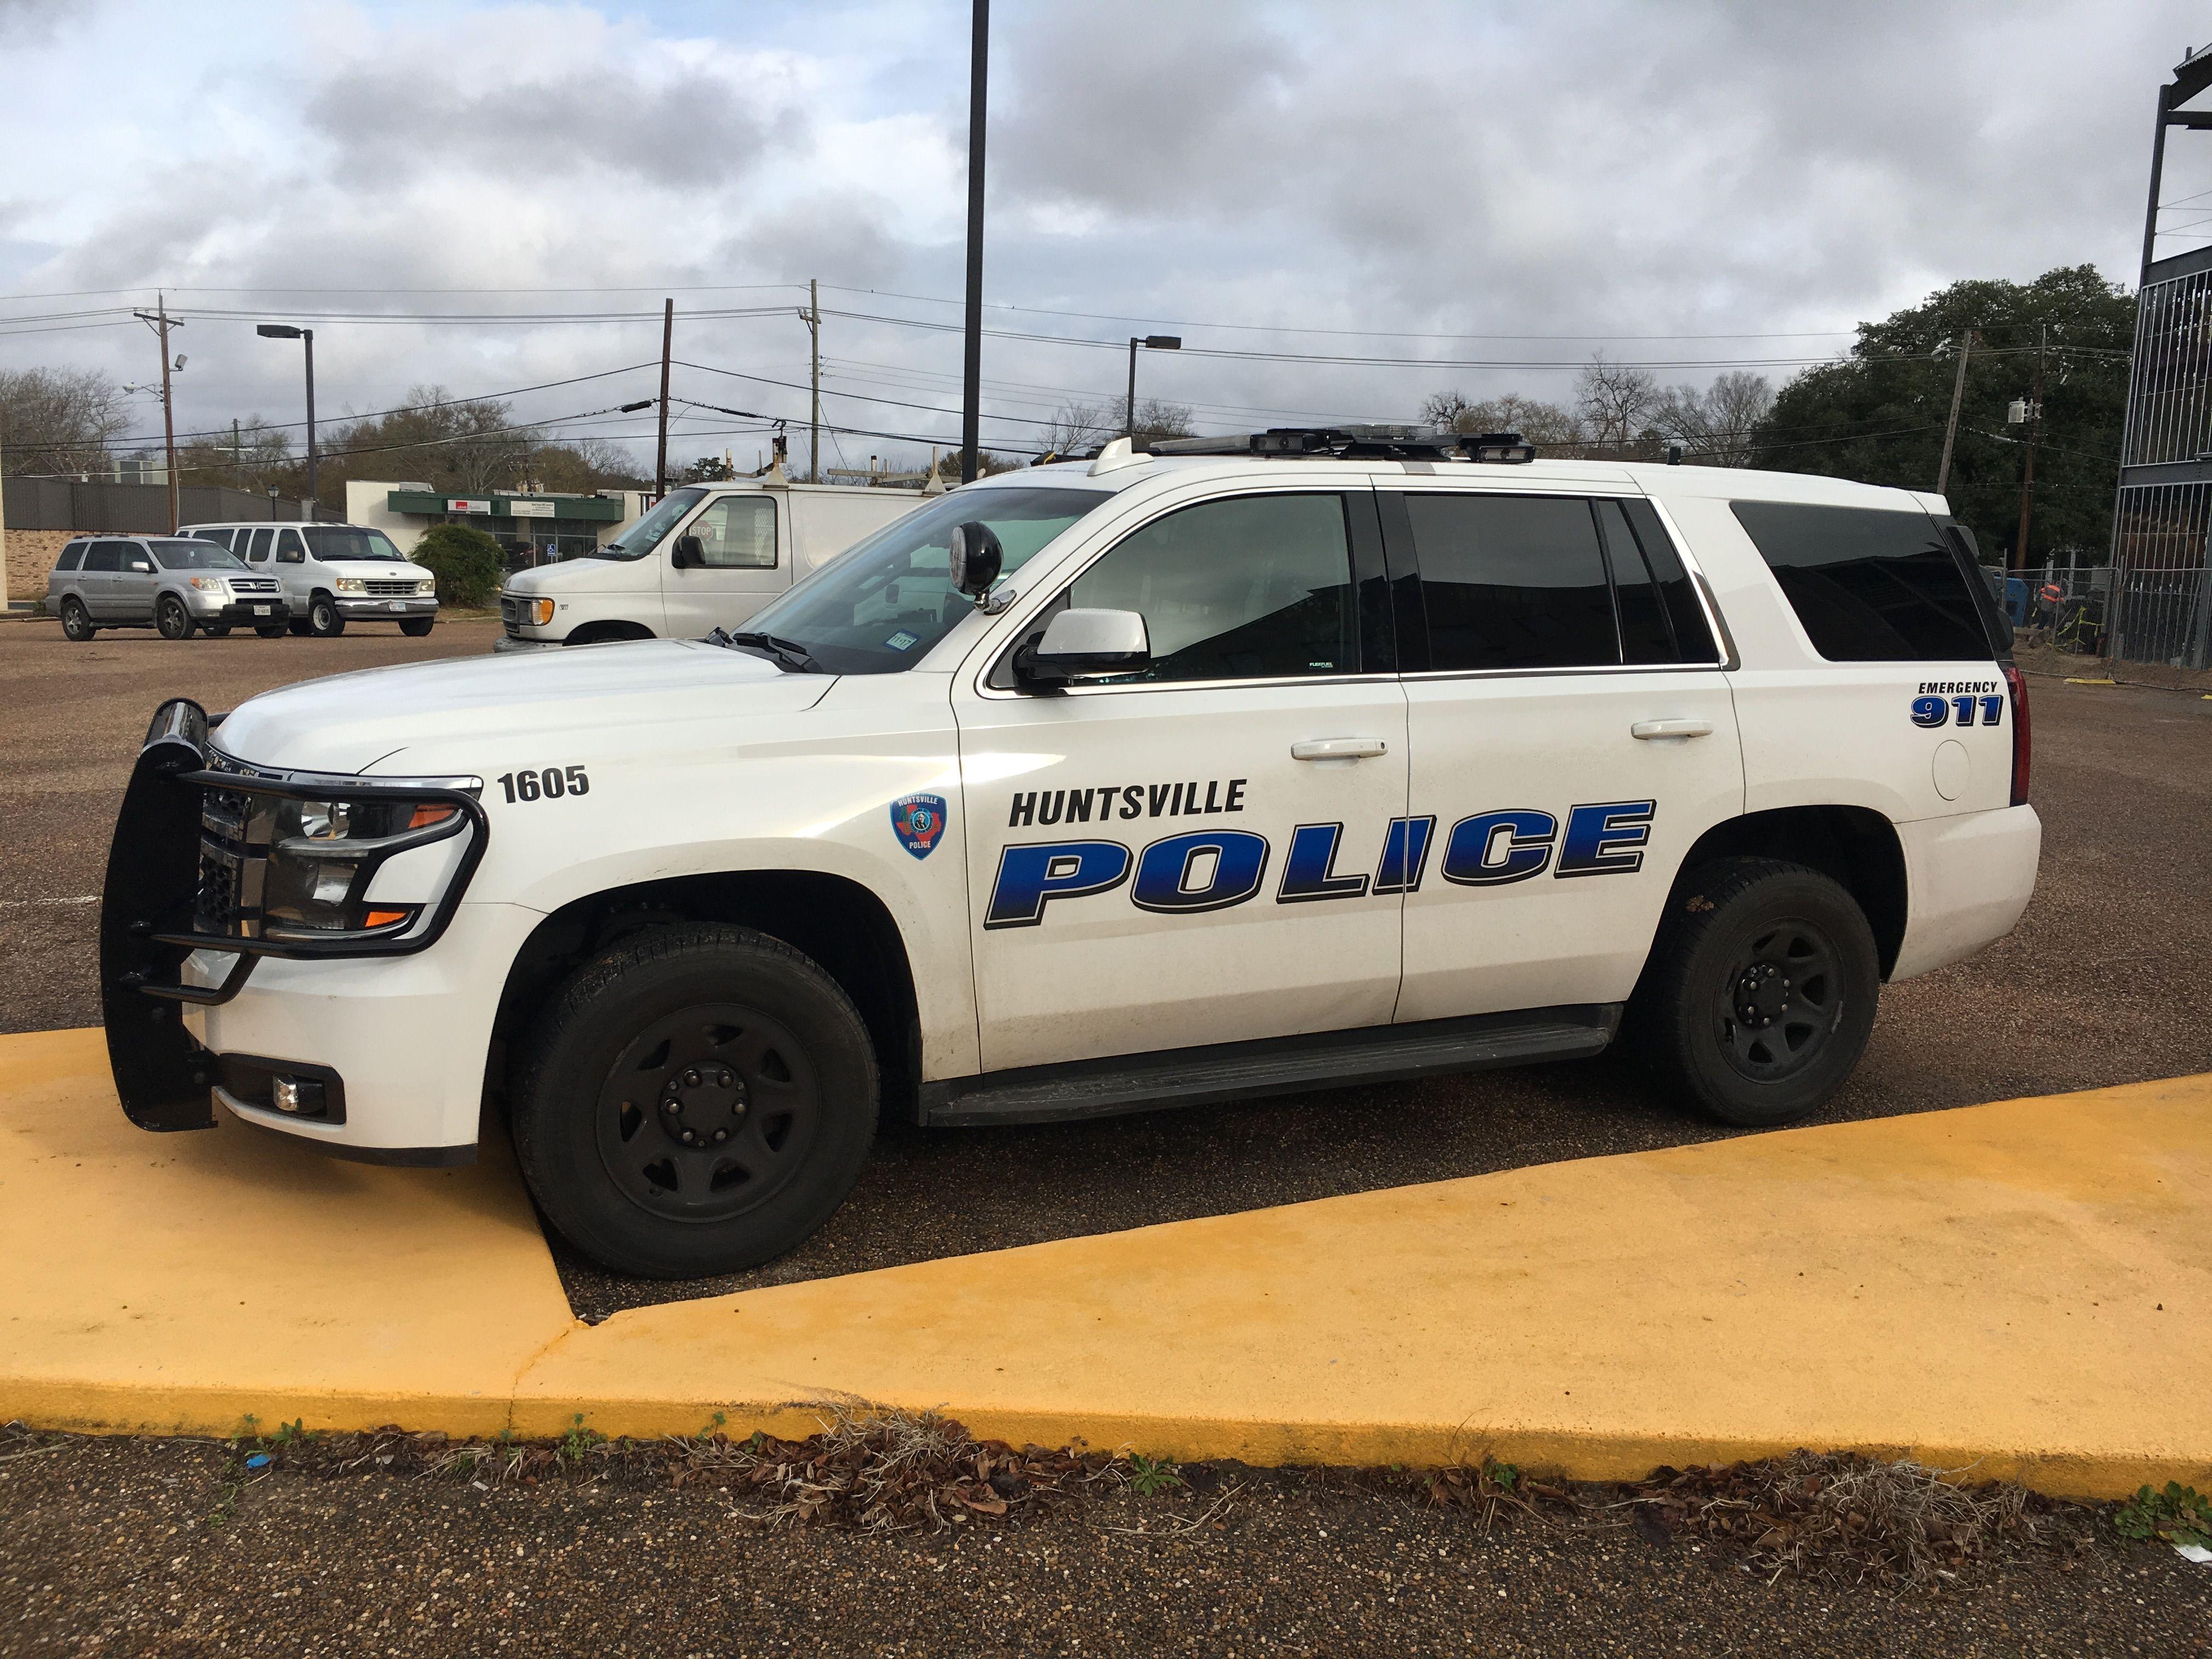 Huntsville Police Department Chevy Tahoe Texas Police Cars Chevy Tahoe Police